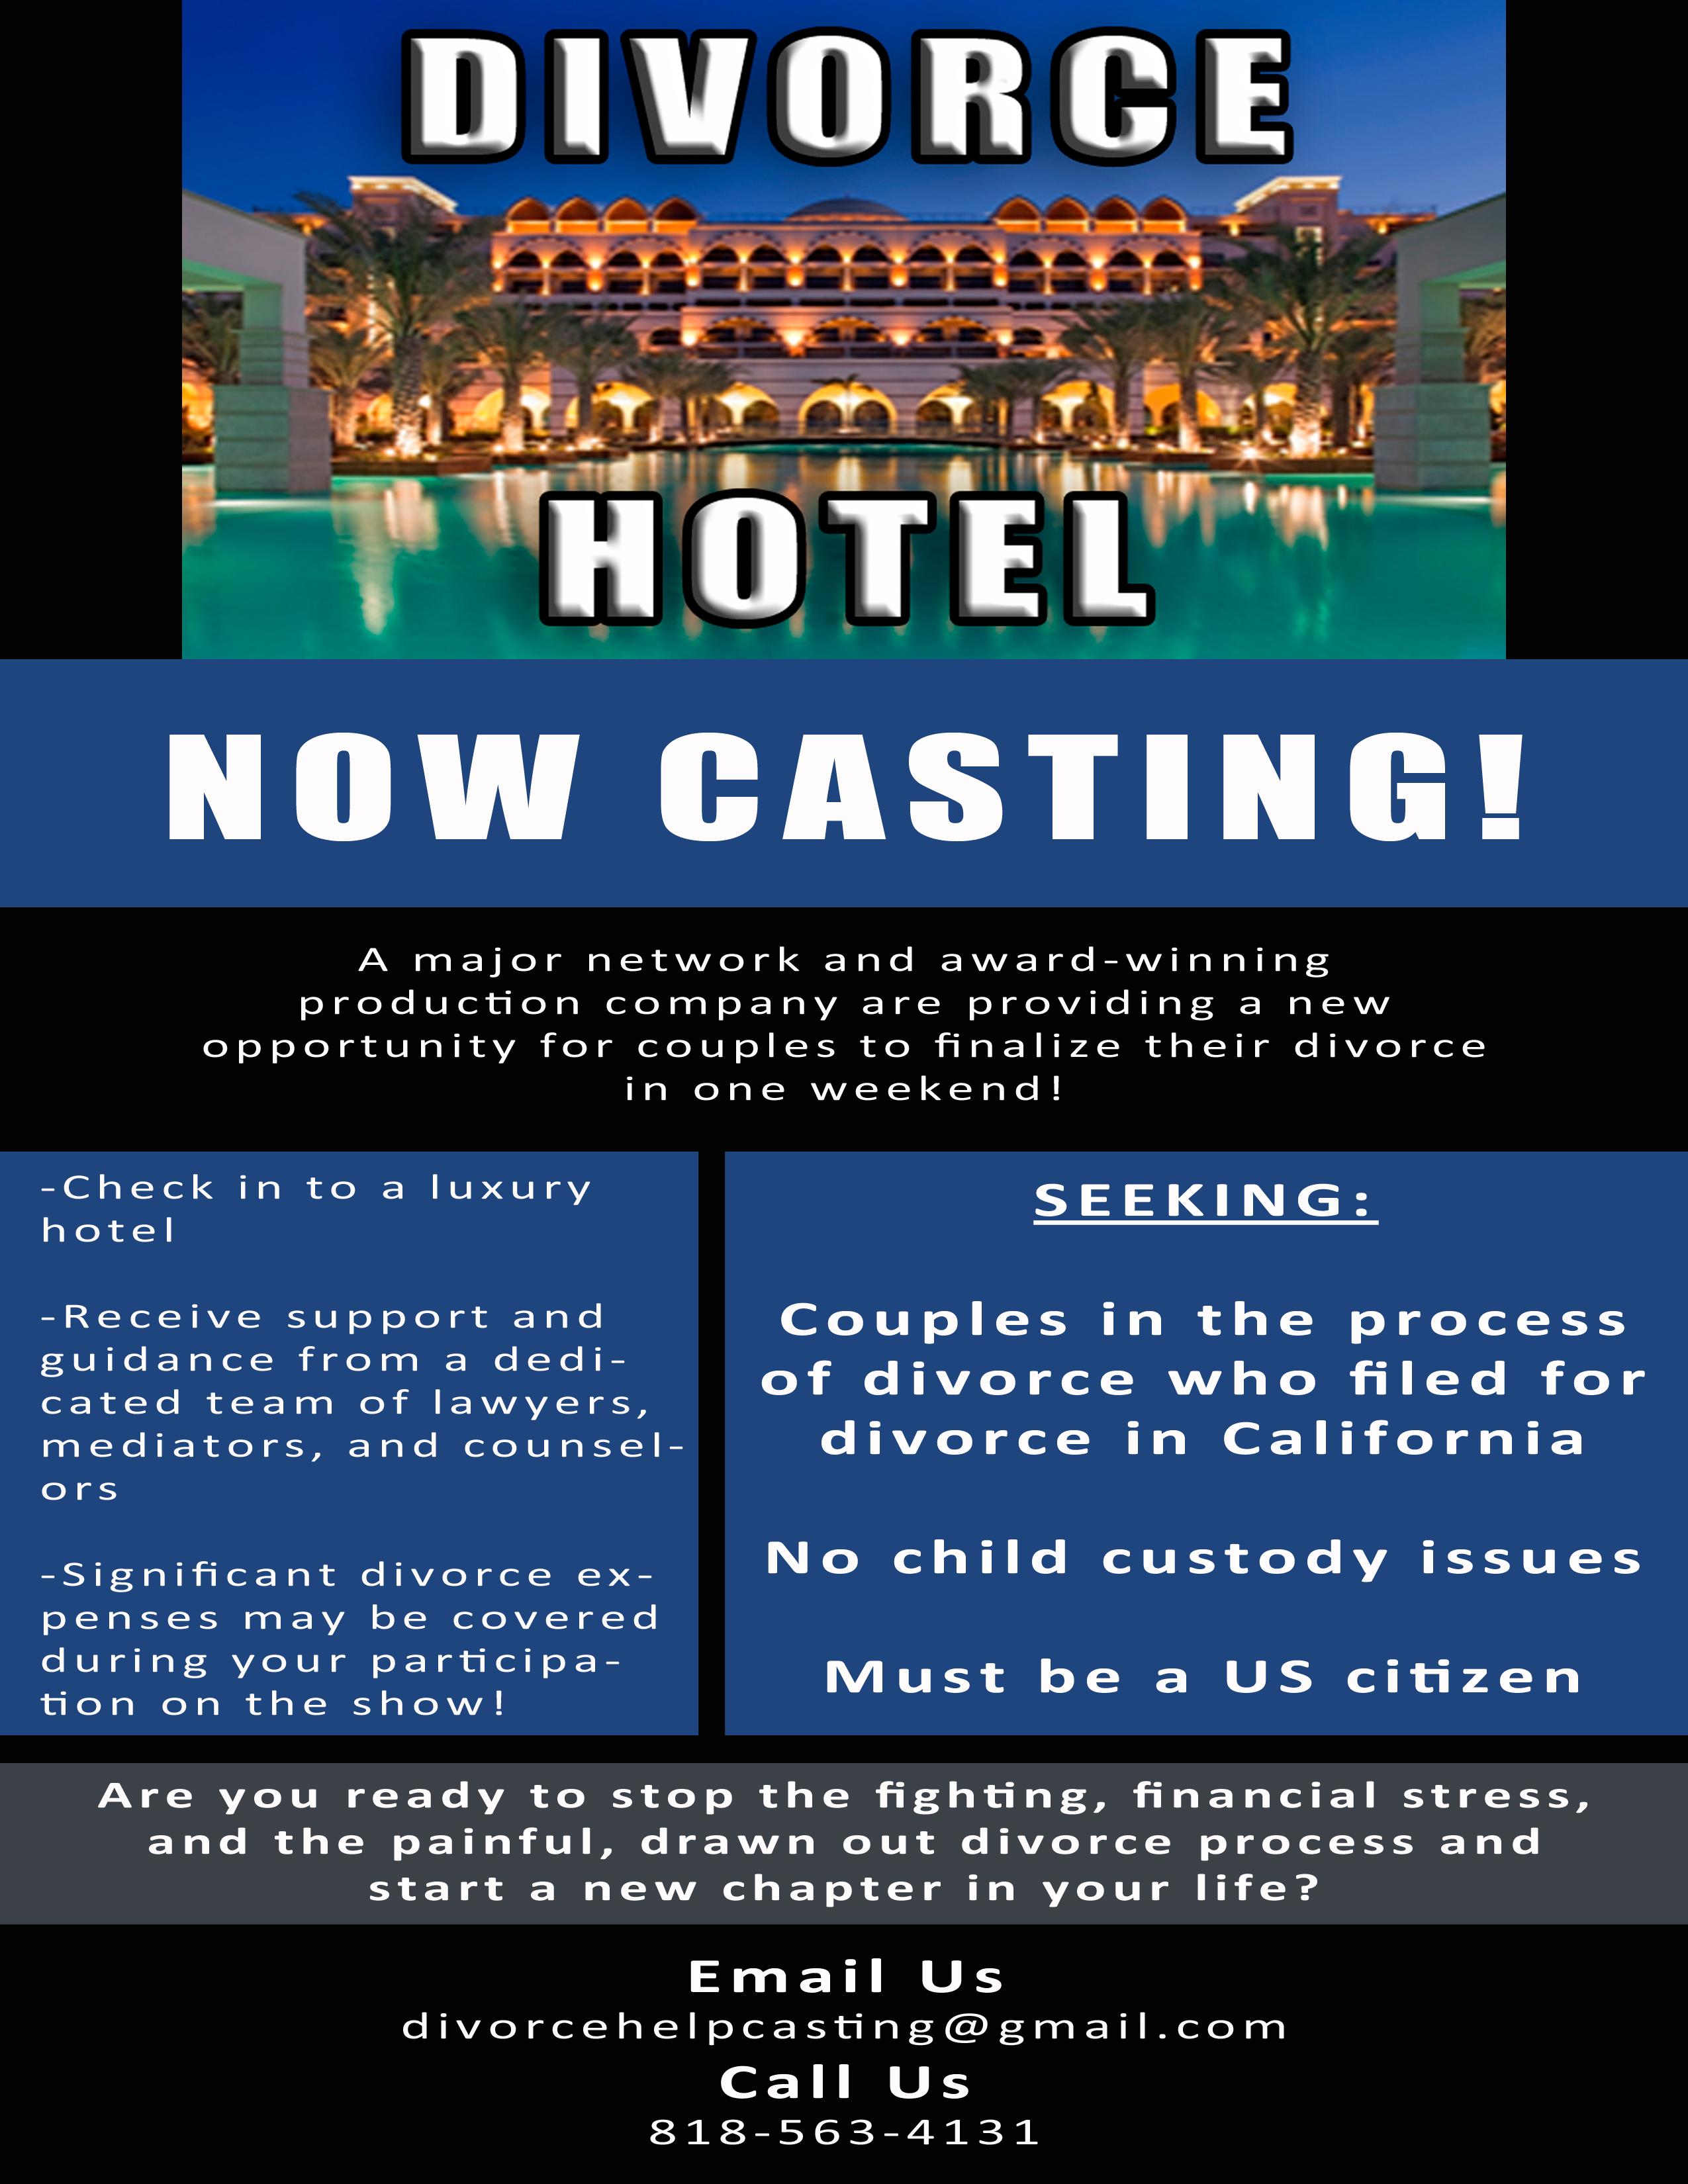 divorce hotel, divorce hotel casting, divorce, casting, separation